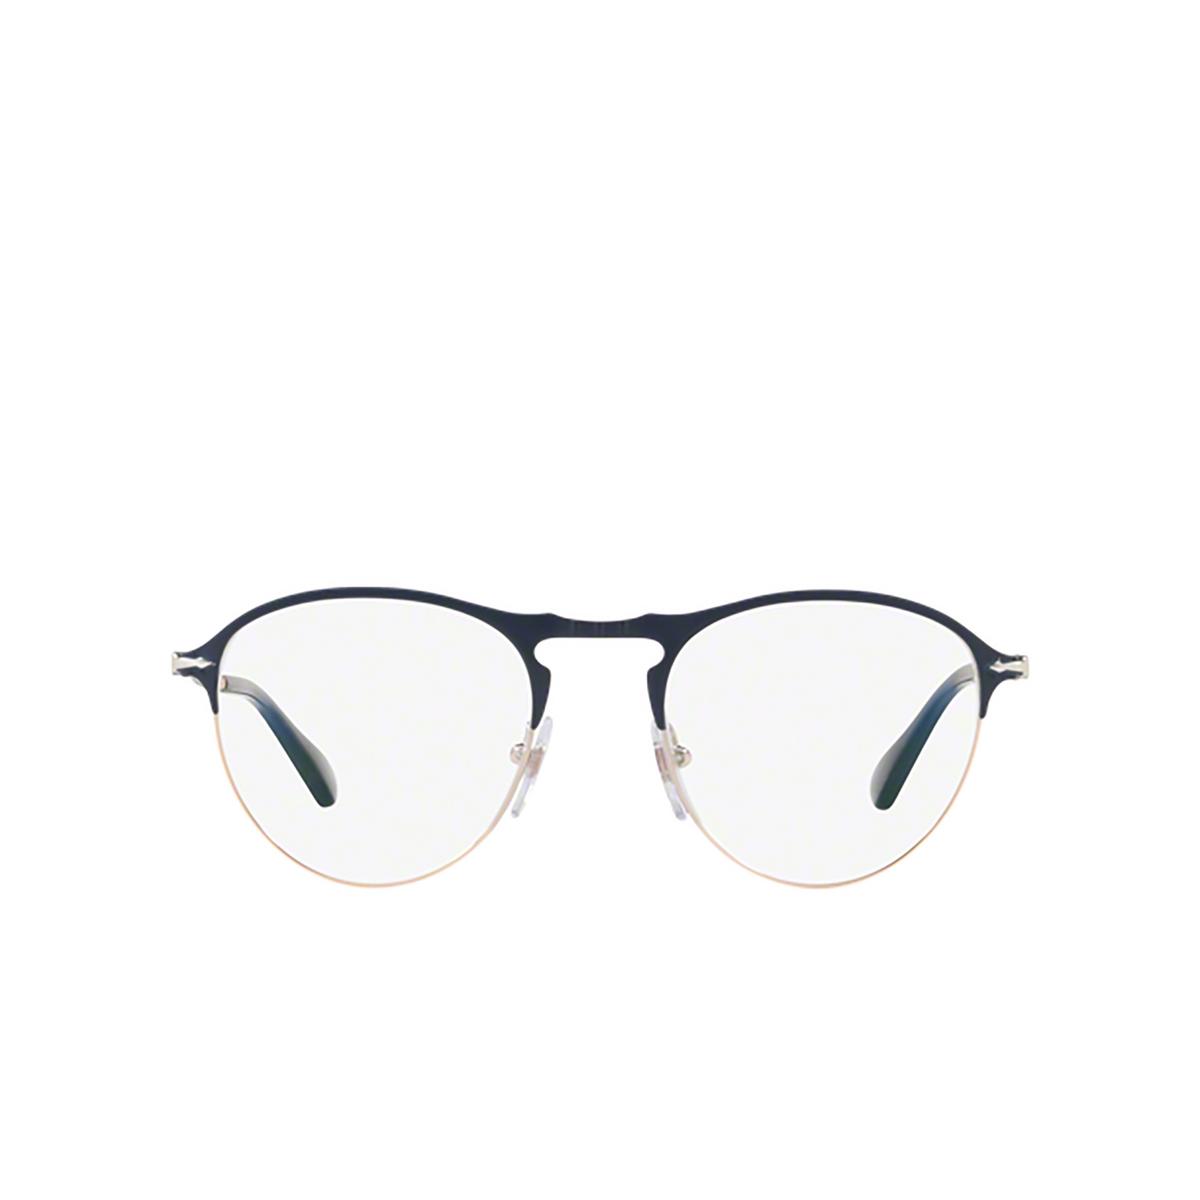 Persol® Round Eyeglasses: PO7092V color Blue / Bronze 1073 - front view.